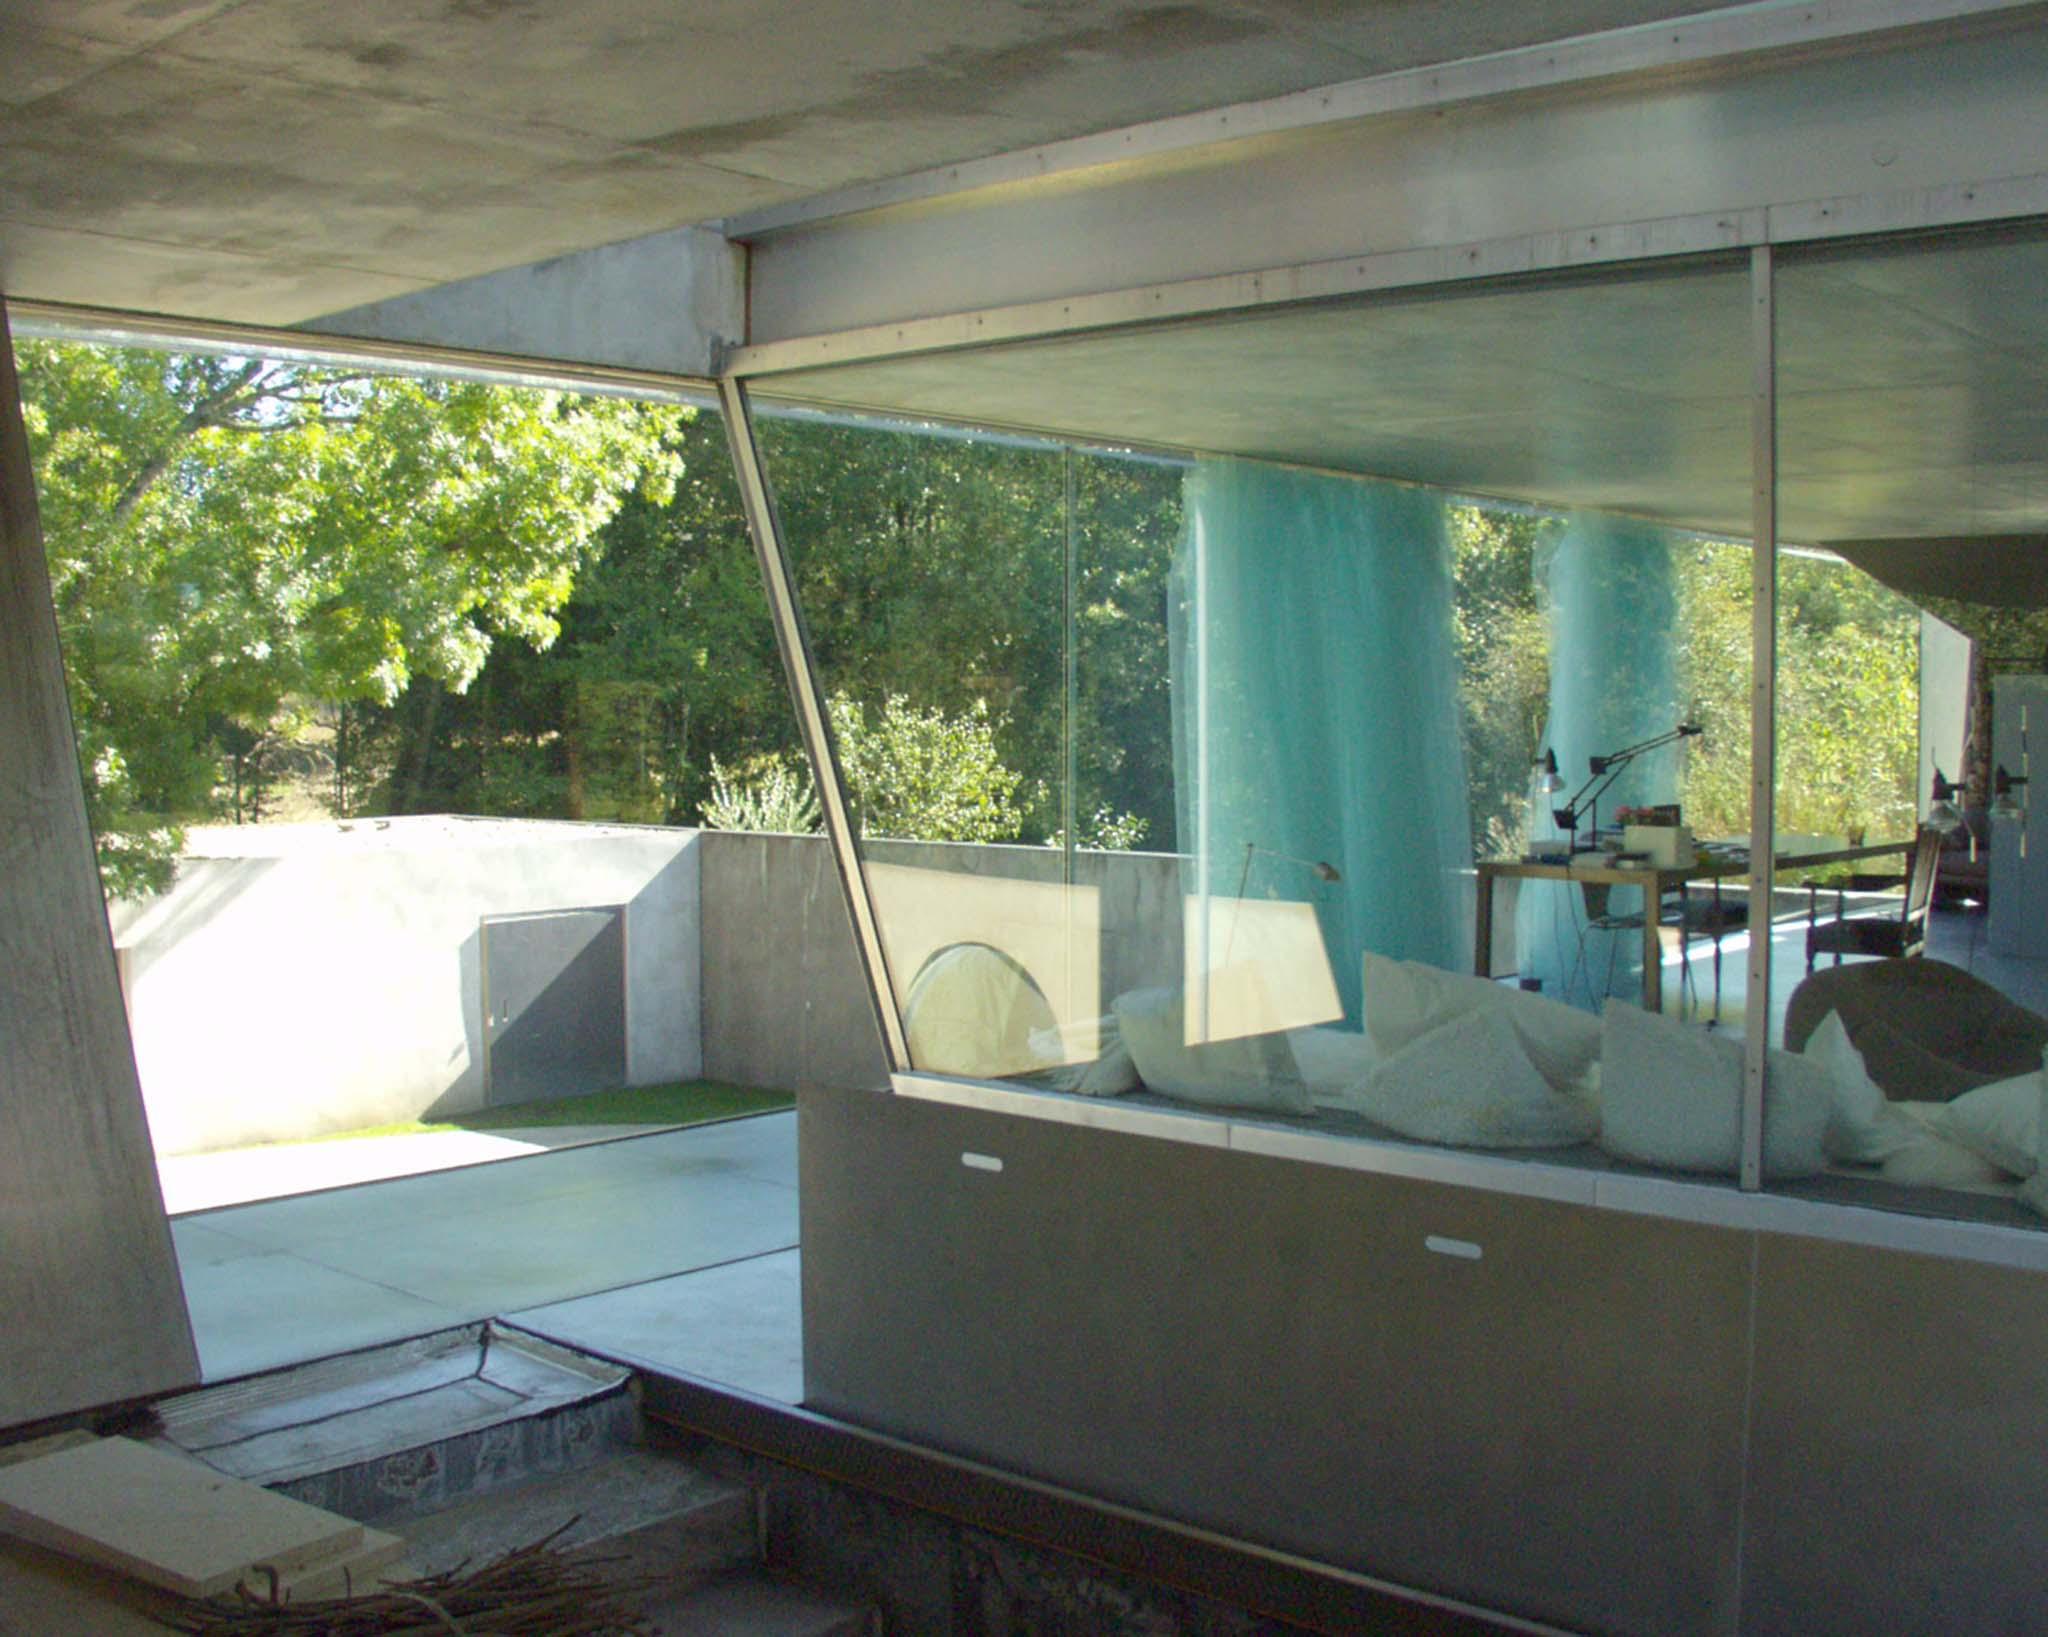 villa lemoine floirac girone rem koolhaas architecte. Black Bedroom Furniture Sets. Home Design Ideas